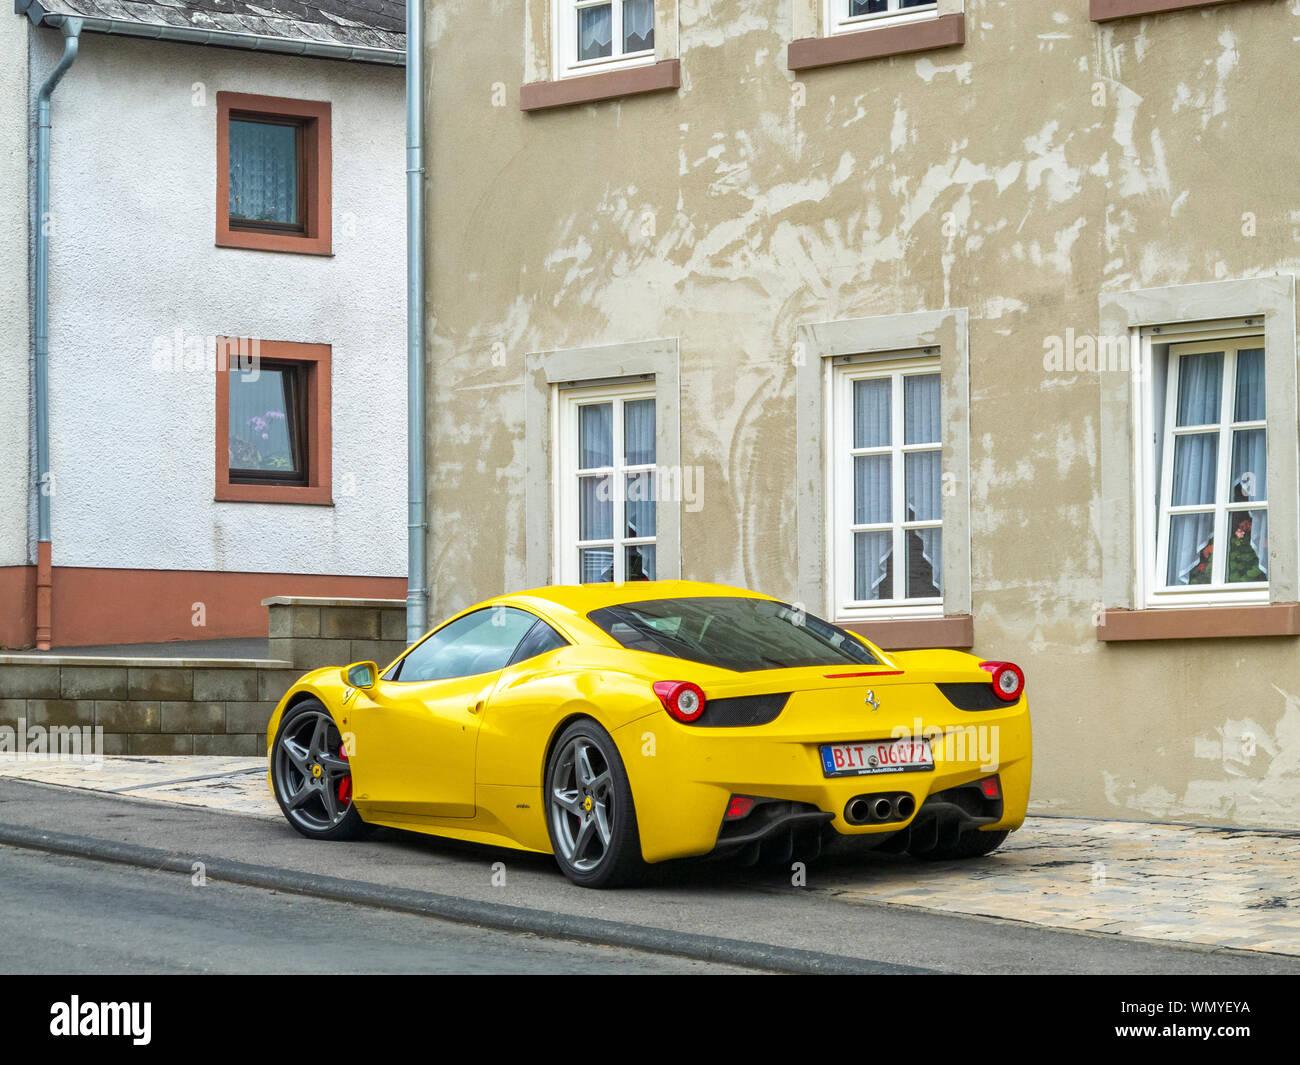 Bleialf Germany May 09 2013 Yellow Parked Ferrari 458 Spider In Bleialf Rhineland Palatinate Germany Stock Photo Alamy